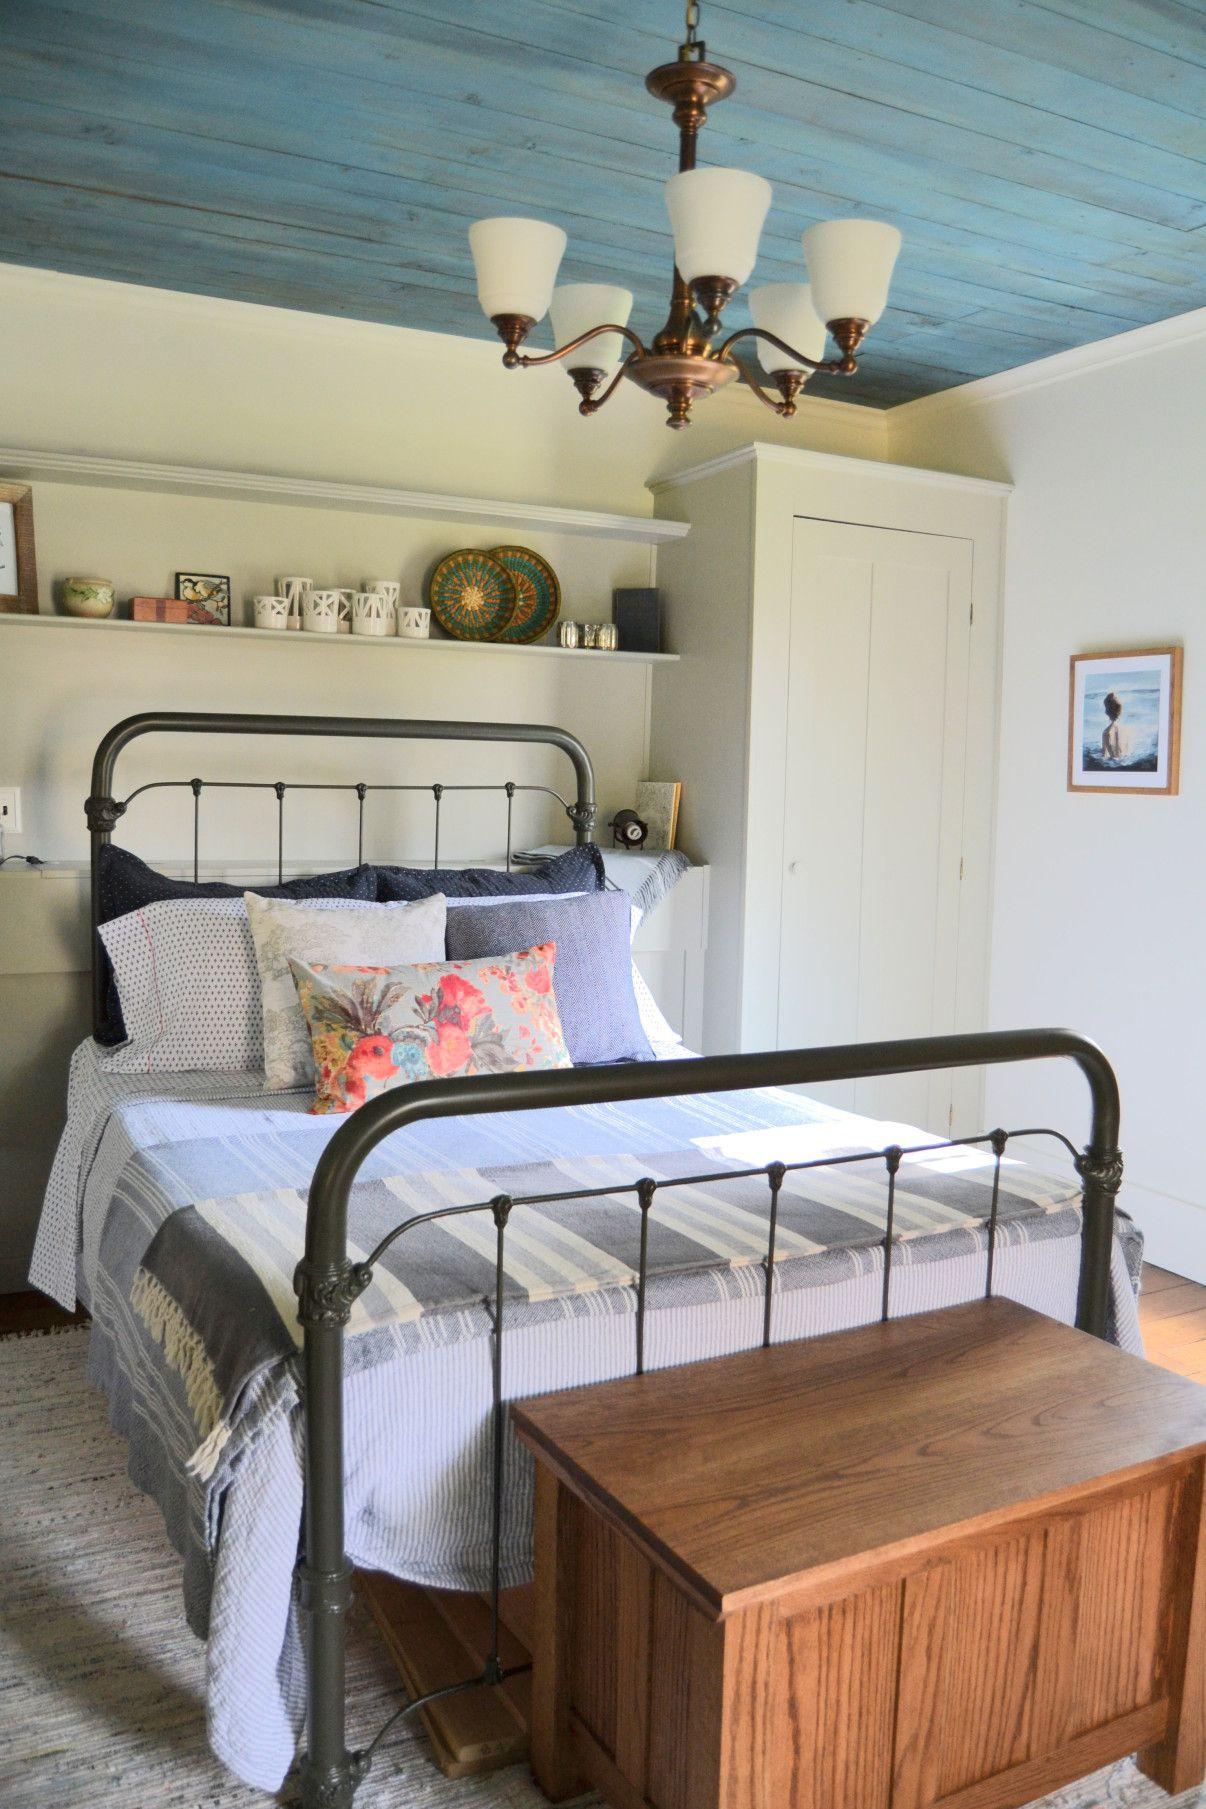 Farmhouse Cottage Bedroom Master Bedrooms Decor Bedroom Design Home Decor Bedroom Cottage bedroom ideas photos